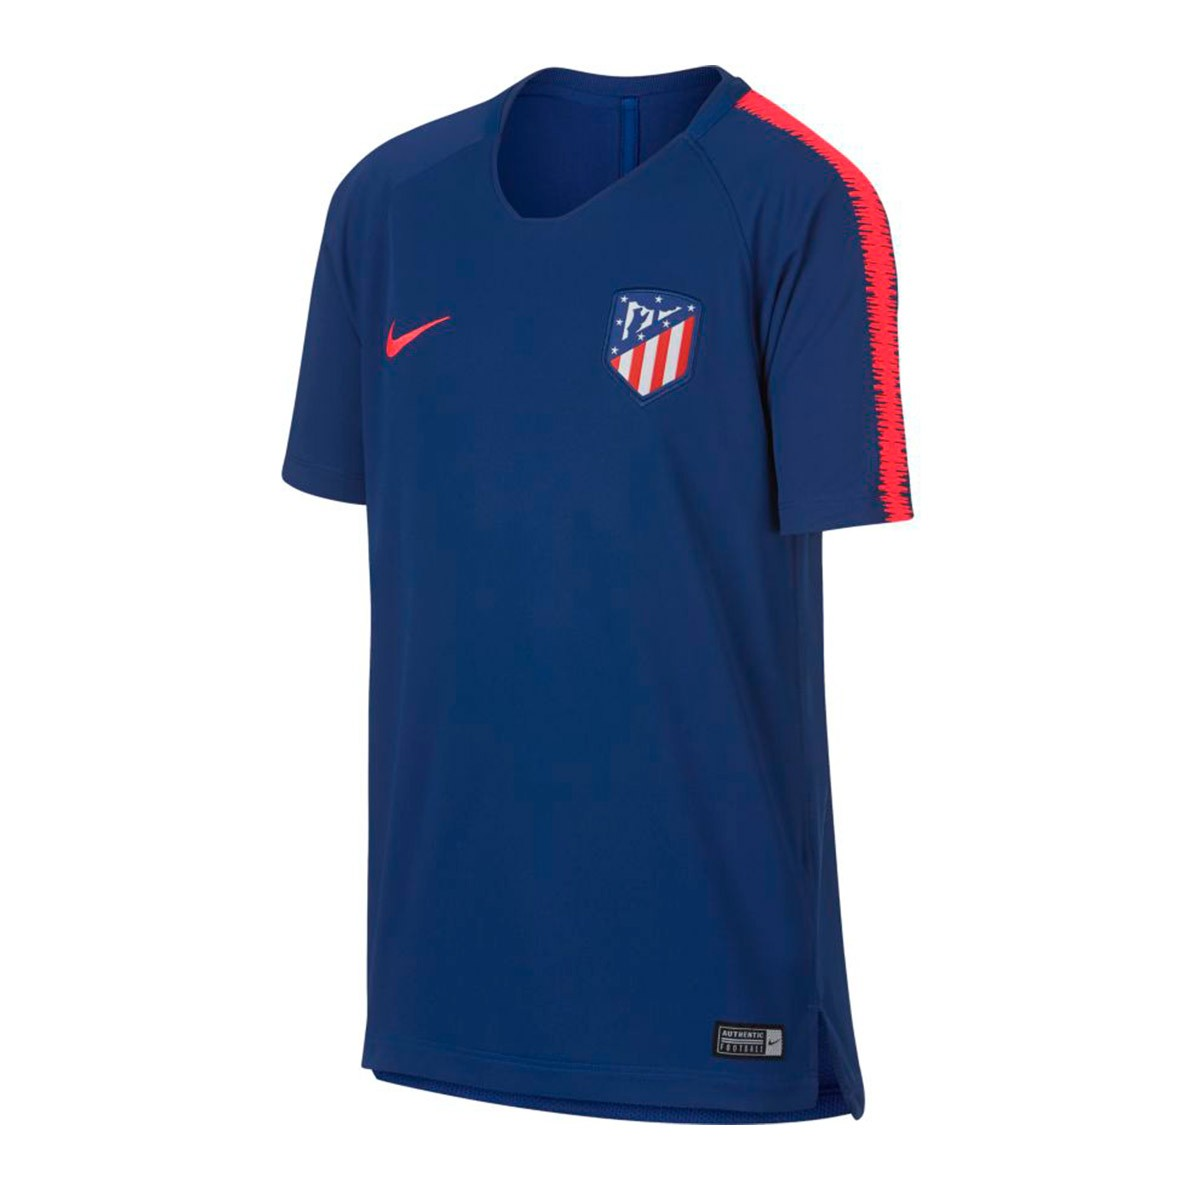 Camiseta Nike Atlético de Madrid Squad 2018-2019 Niño Deep royal  blue-Bright crimson - Soloporteros es ahora Fútbol Emotion 79178b0eb1ce7